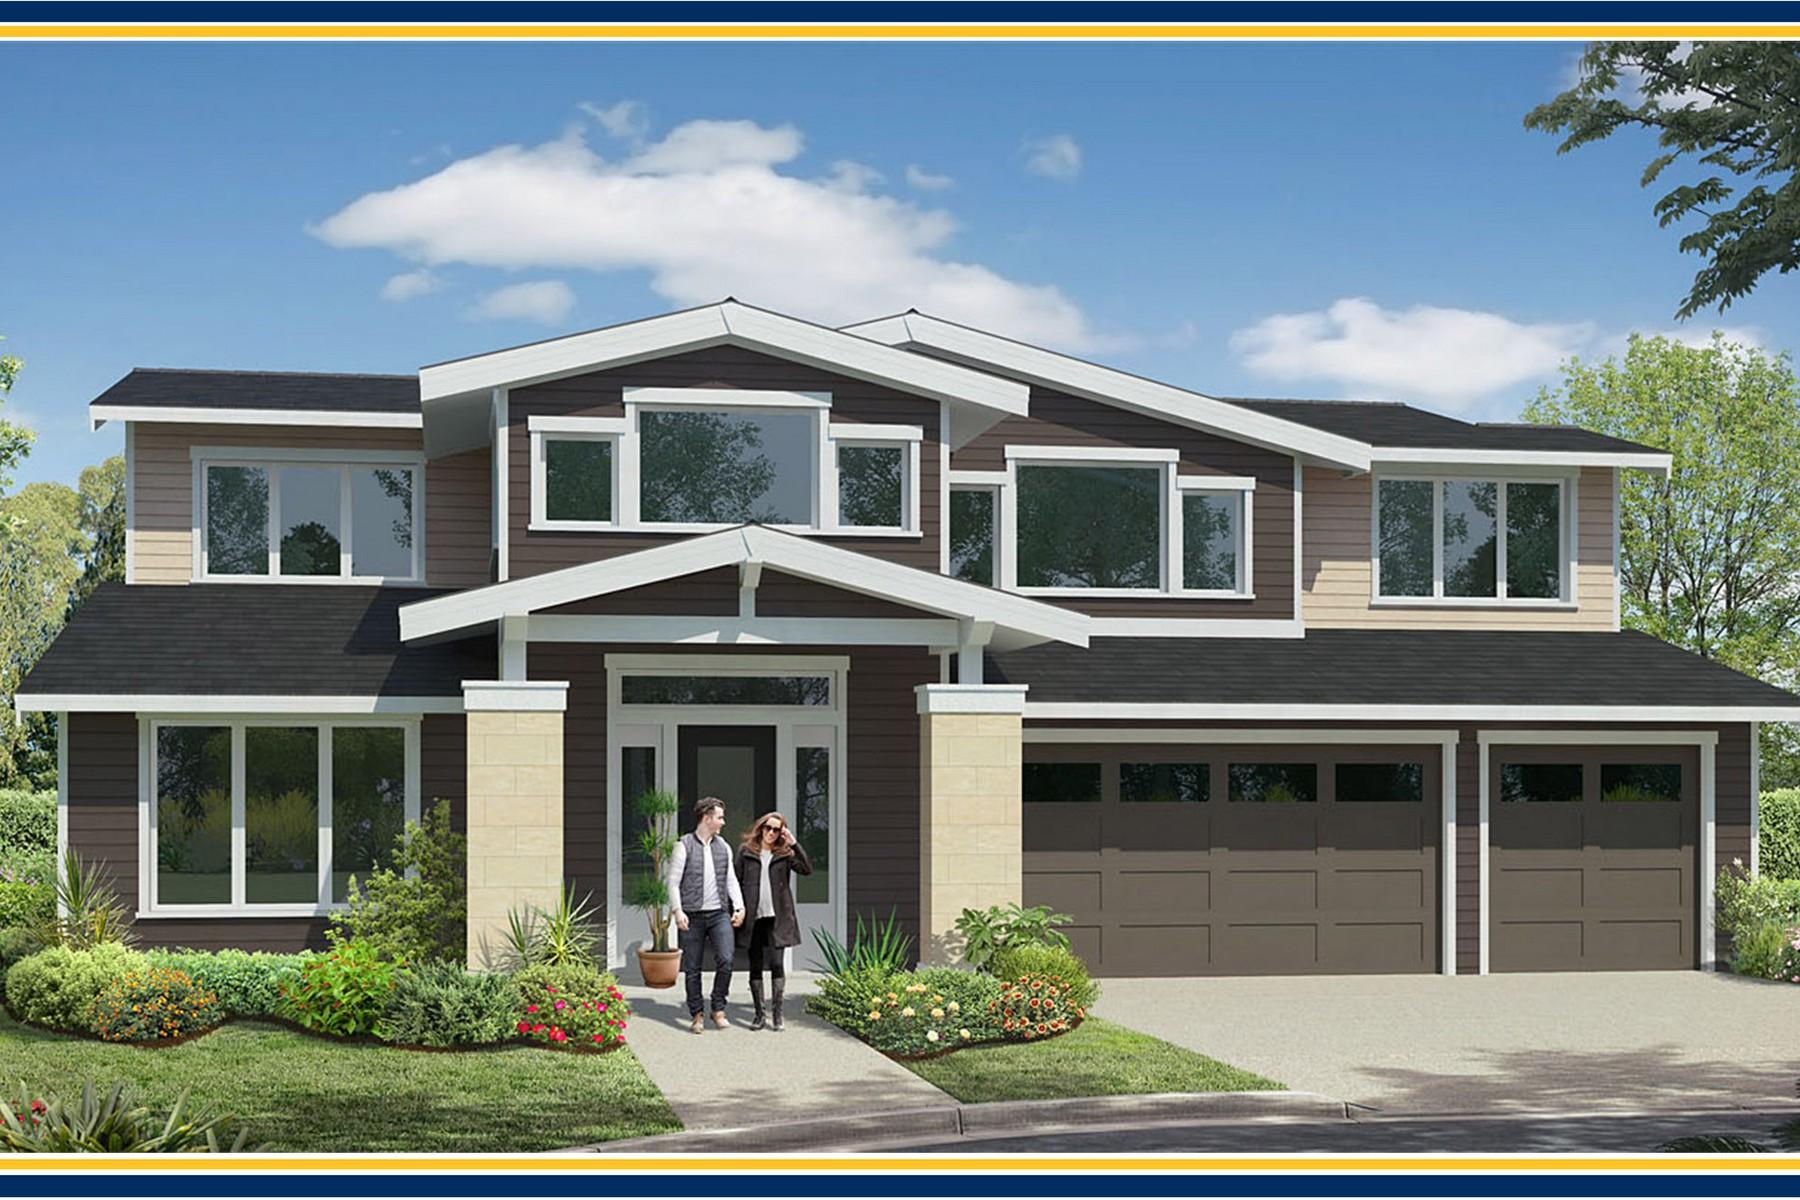 Single Family Home for Sale at BDR Homes Rose Hill Presale 11837 NE 73rd Street Kirkland, Washington, 98033 United States